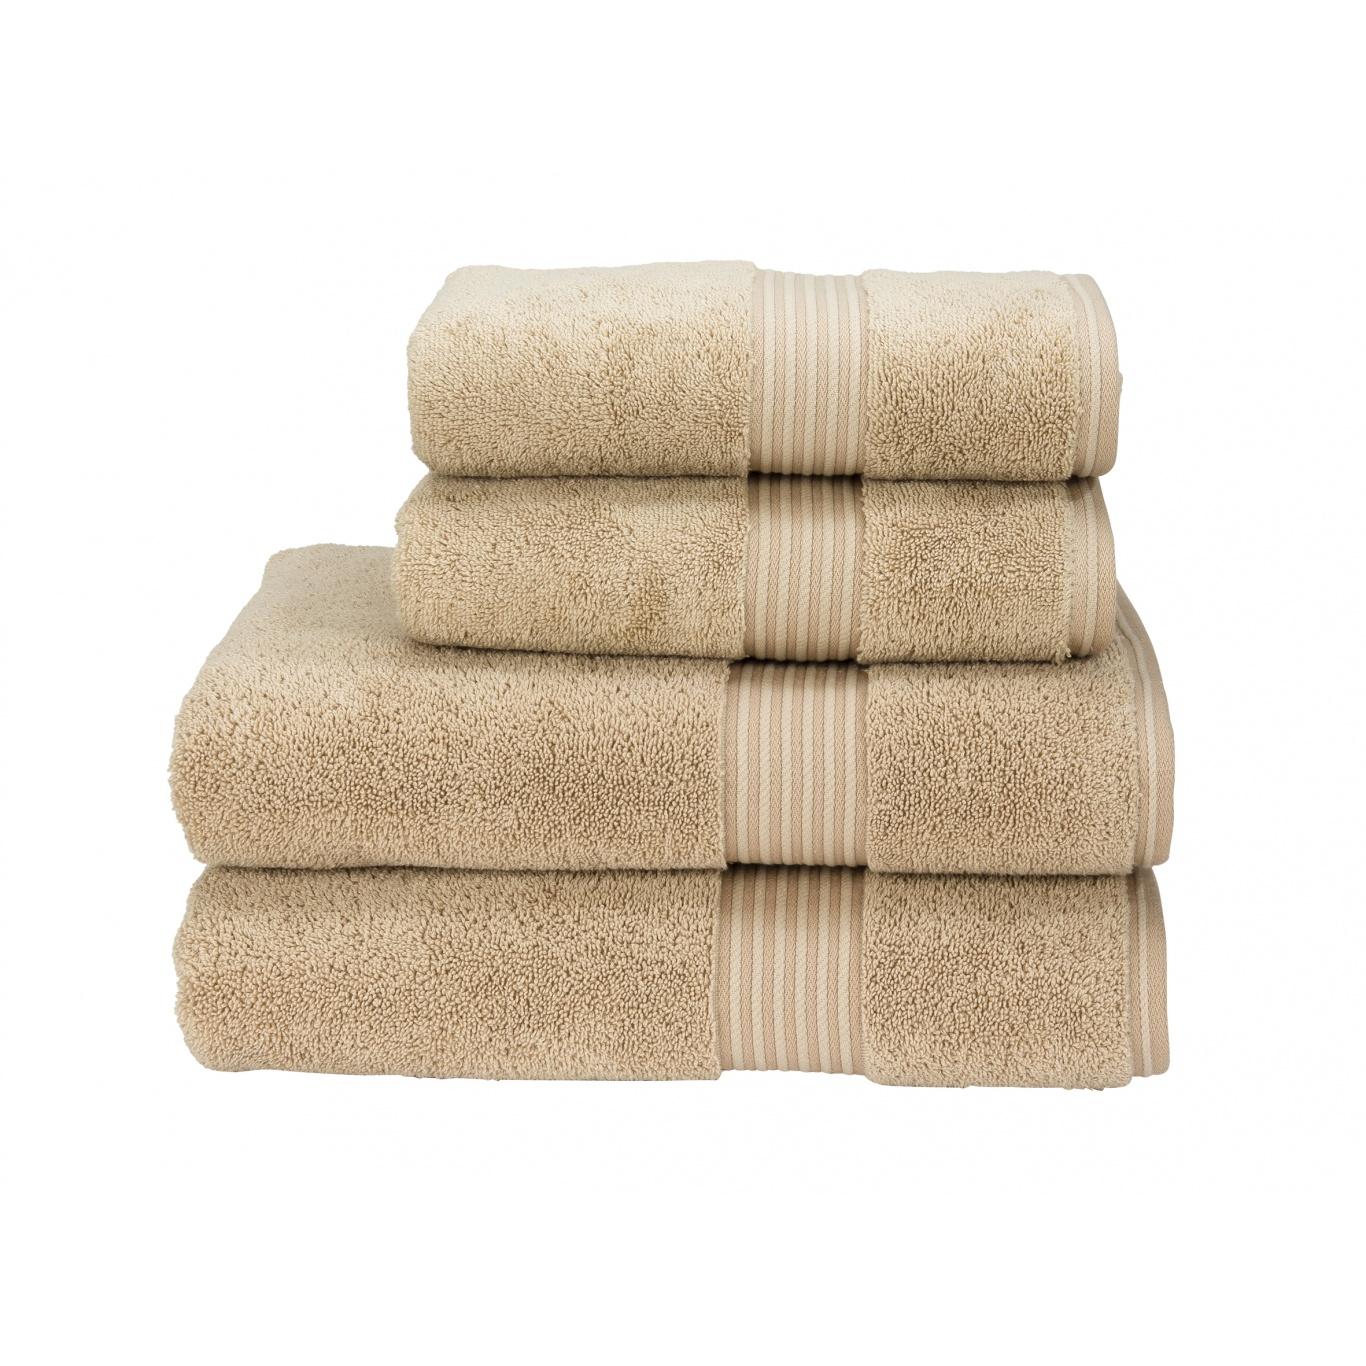 Image of Christy Supreme Supima Hygro Stone Towels